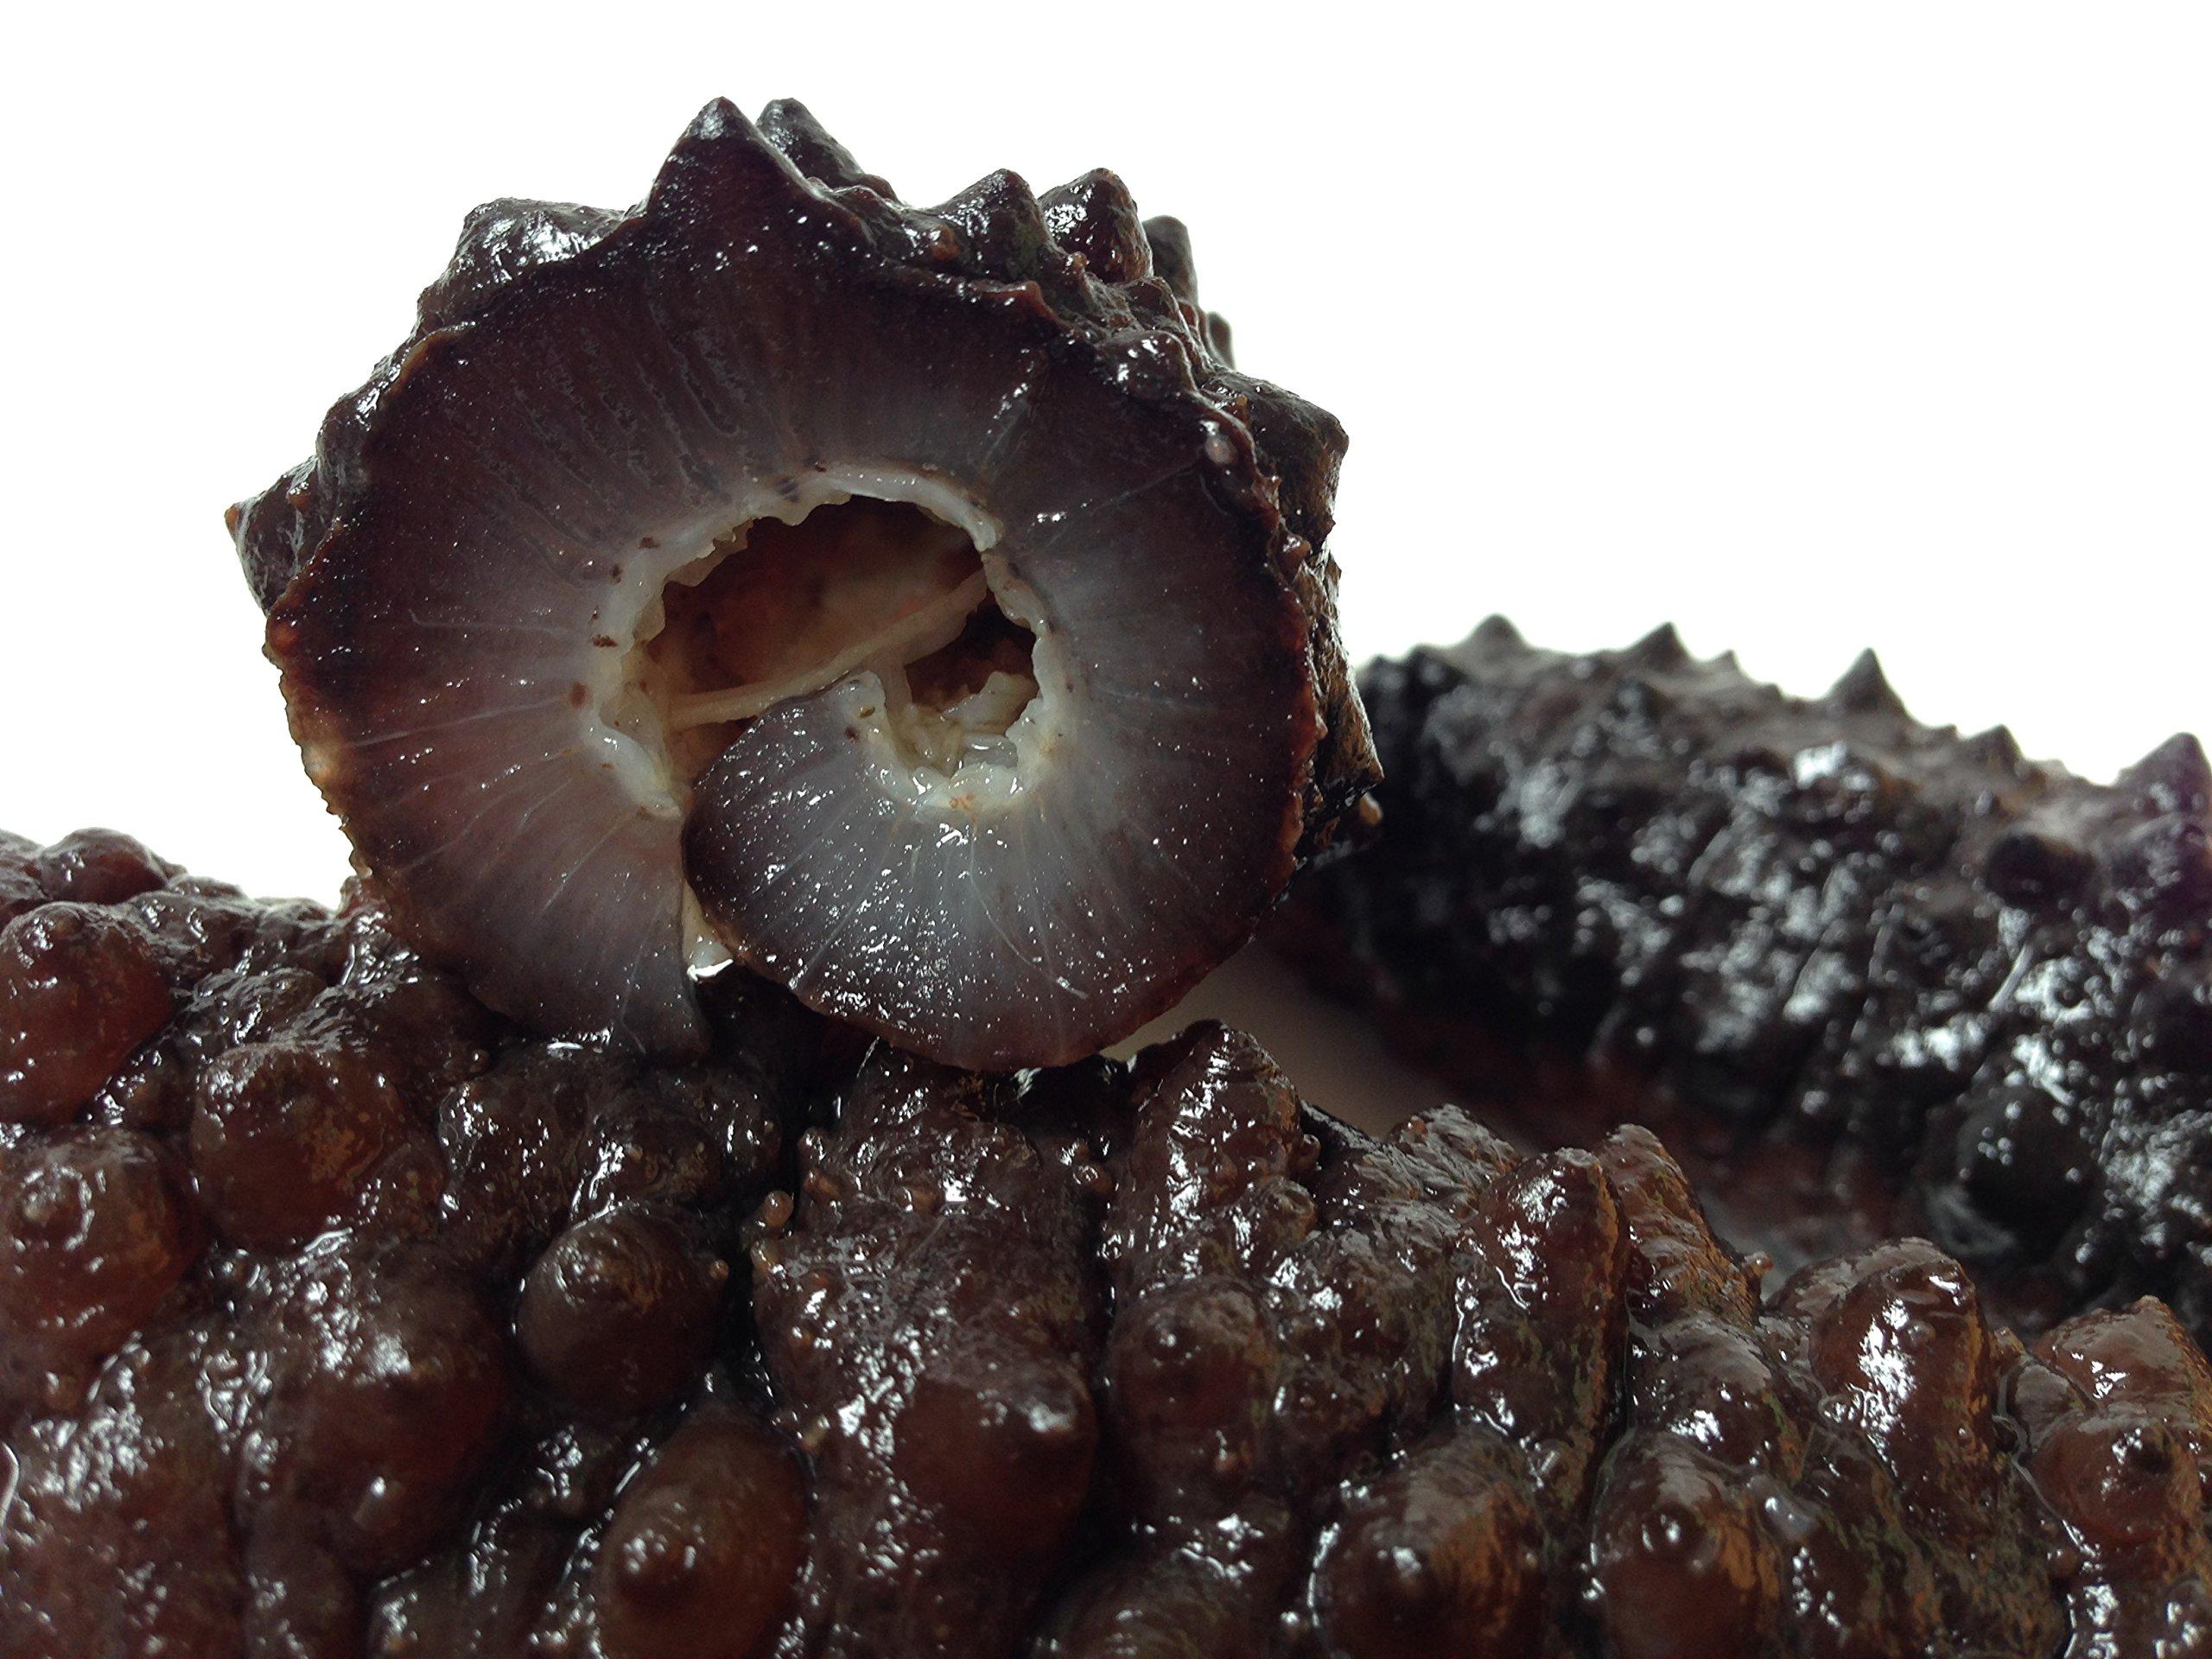 海参天下 Wild Black pin Atlantic Dried Sea cucumber 8oz pack (60-90pcs #5)大西洋岩刺参 8oz(60-90头,5号) by Sea Cucumber Inc (Image #2)